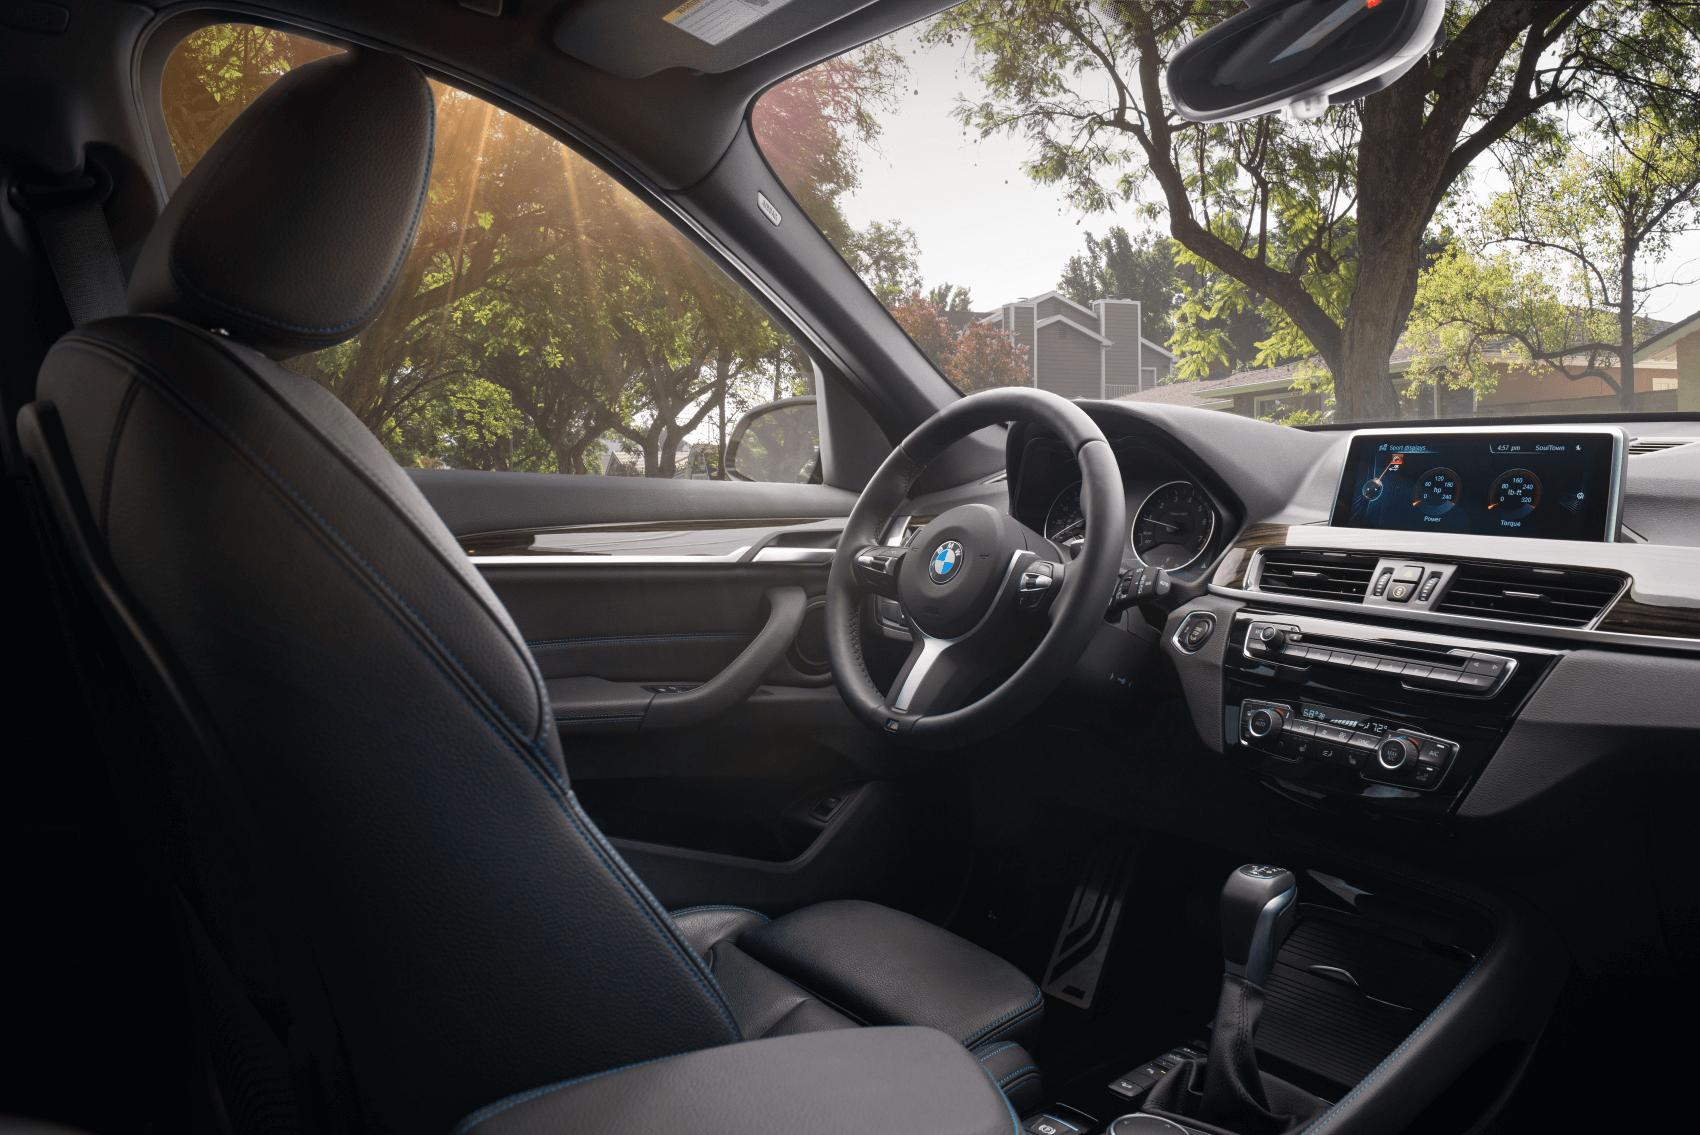 BMW X1 Interior Tech